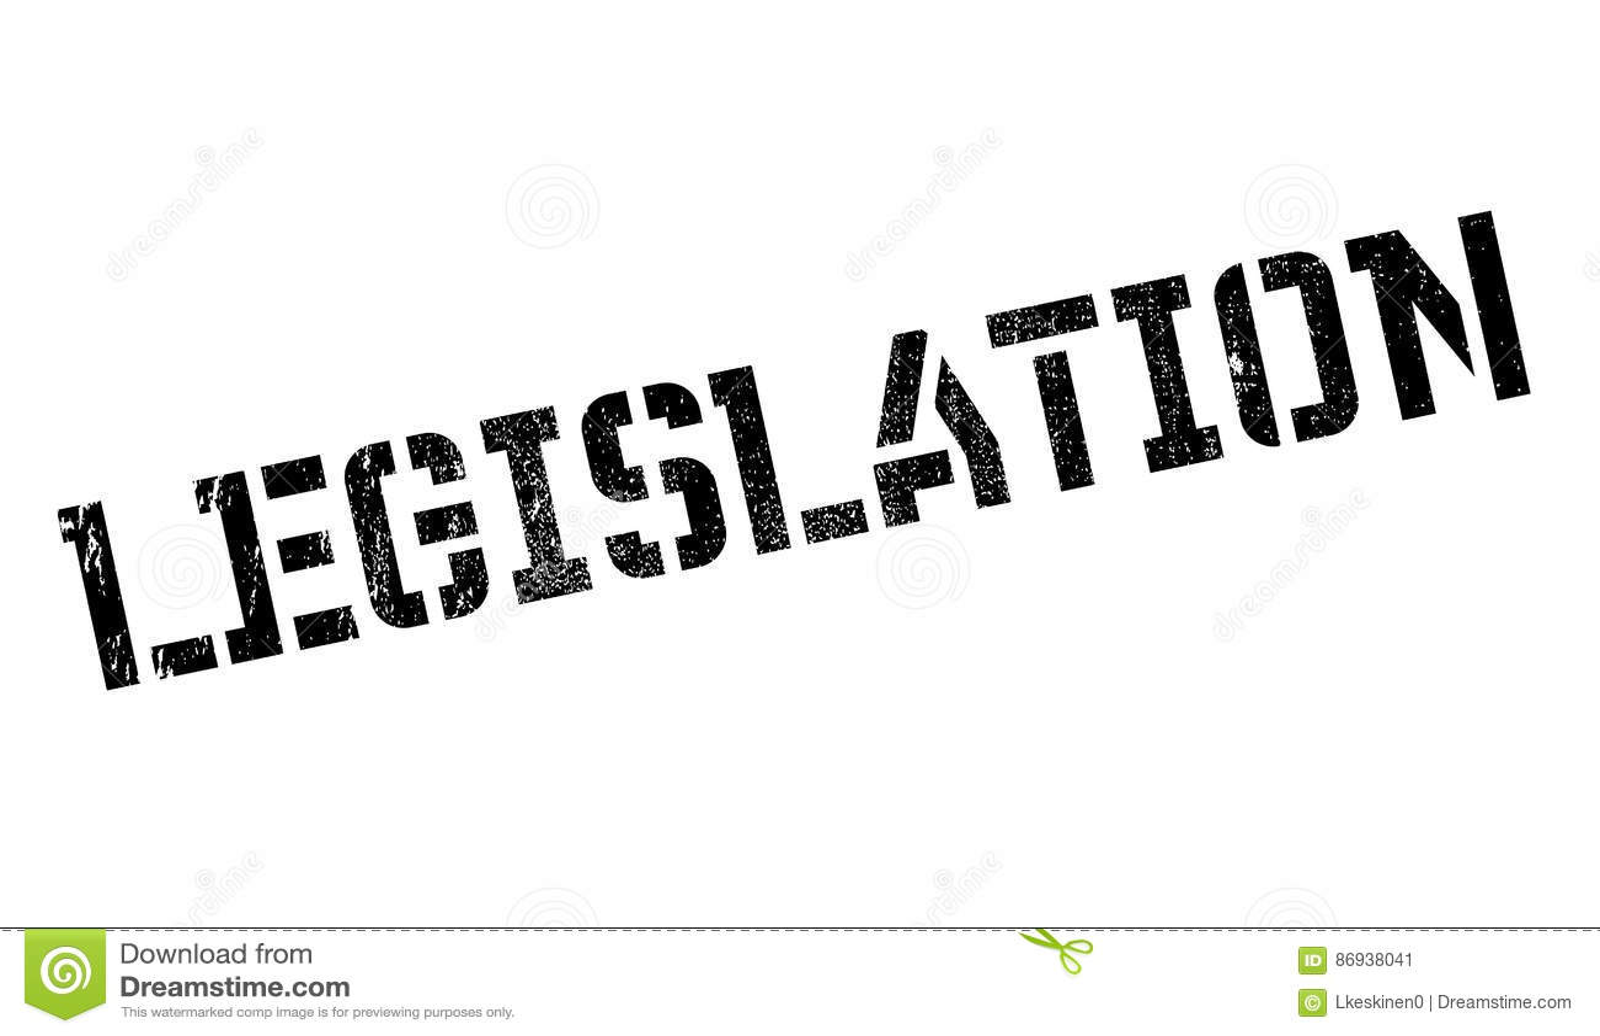 Legislation Rubber Stamp Royalty-Free Stock Image